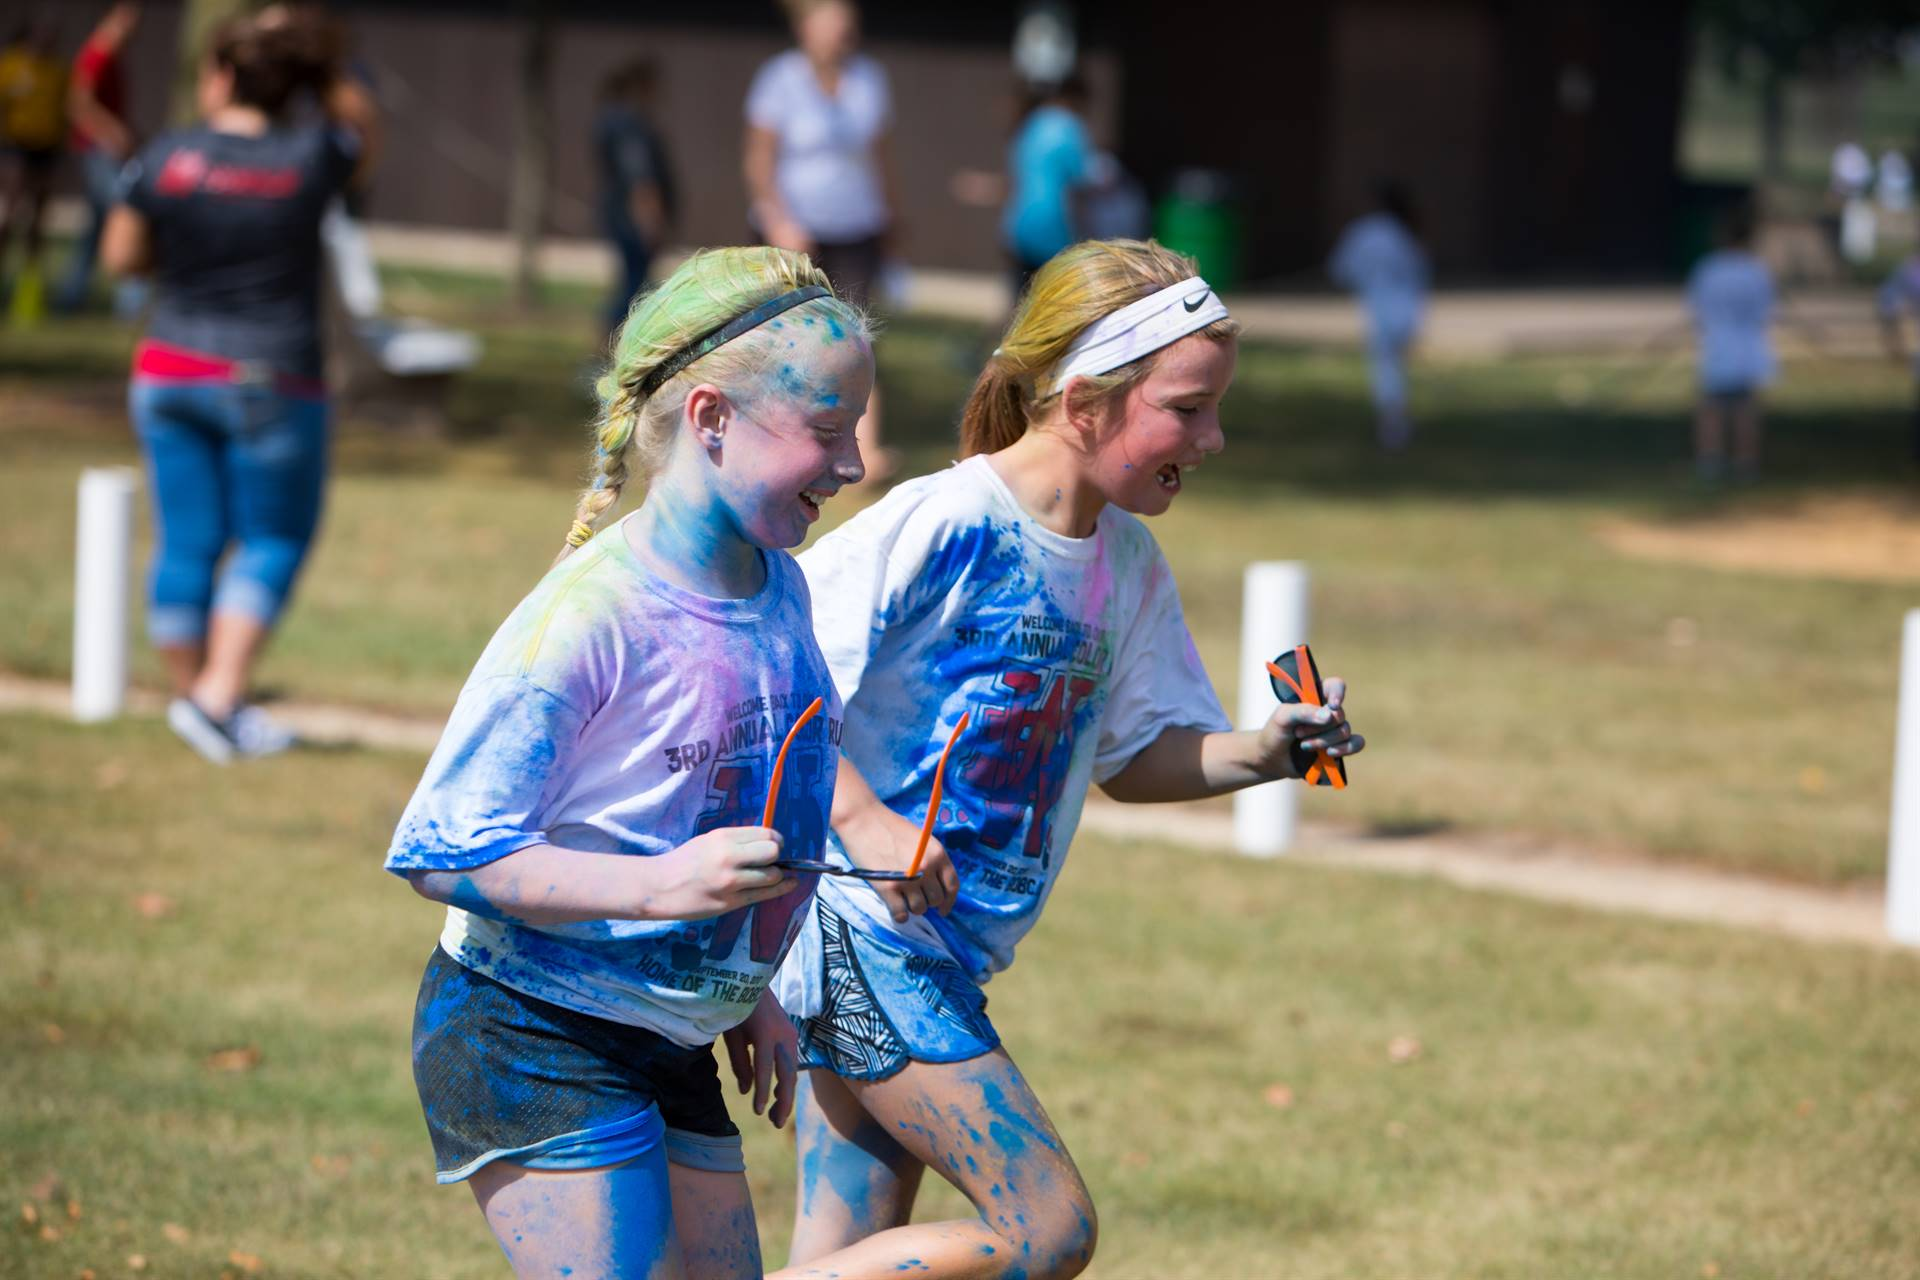 2 girls running at color run